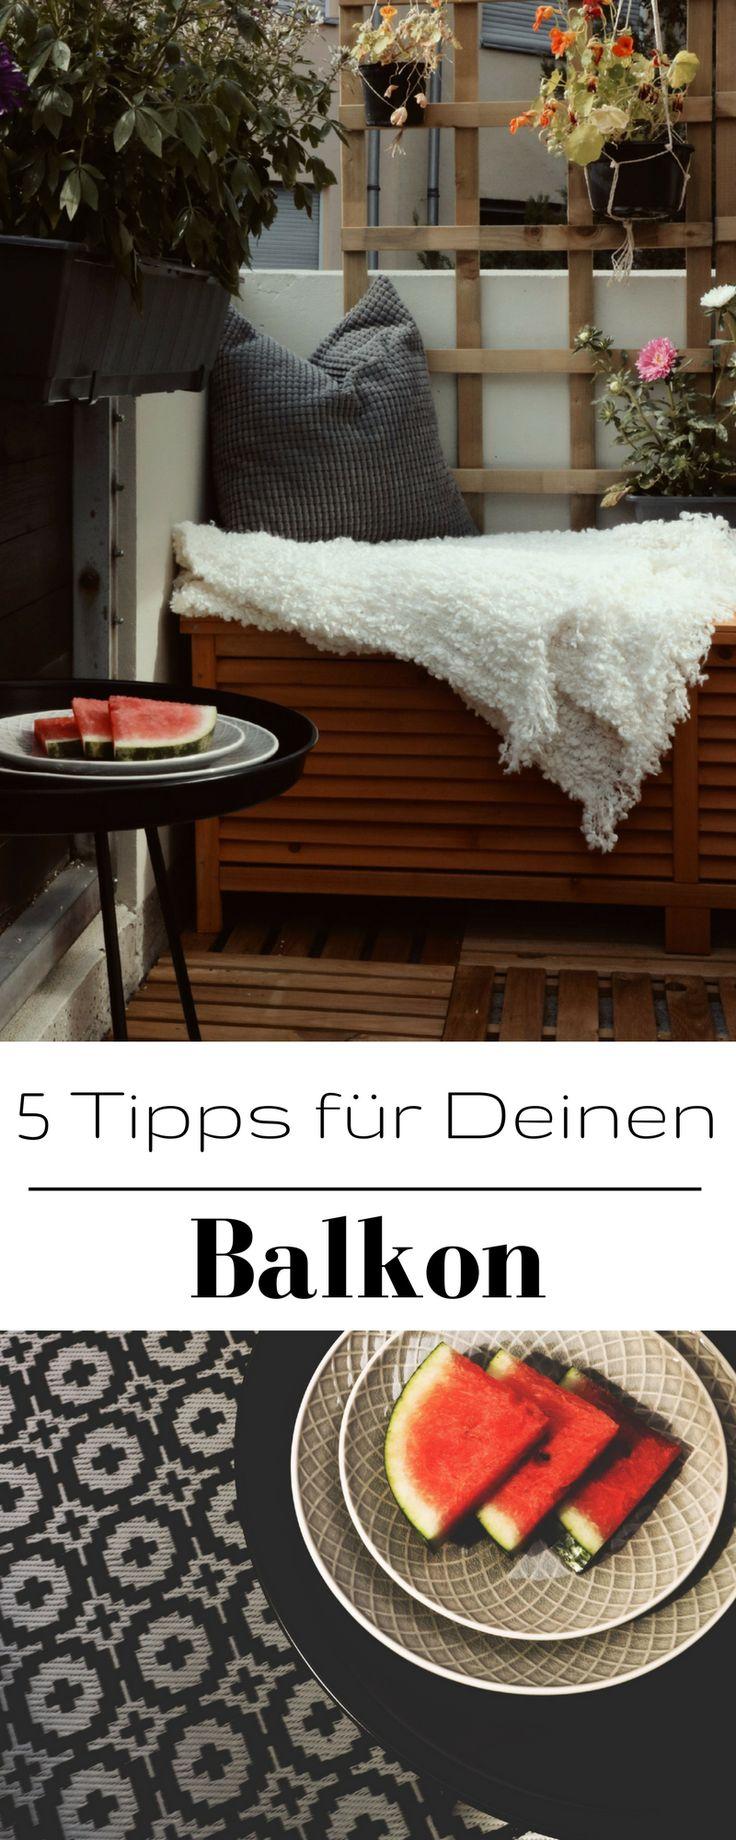 117 best Balkon Gedanken images on Pinterest